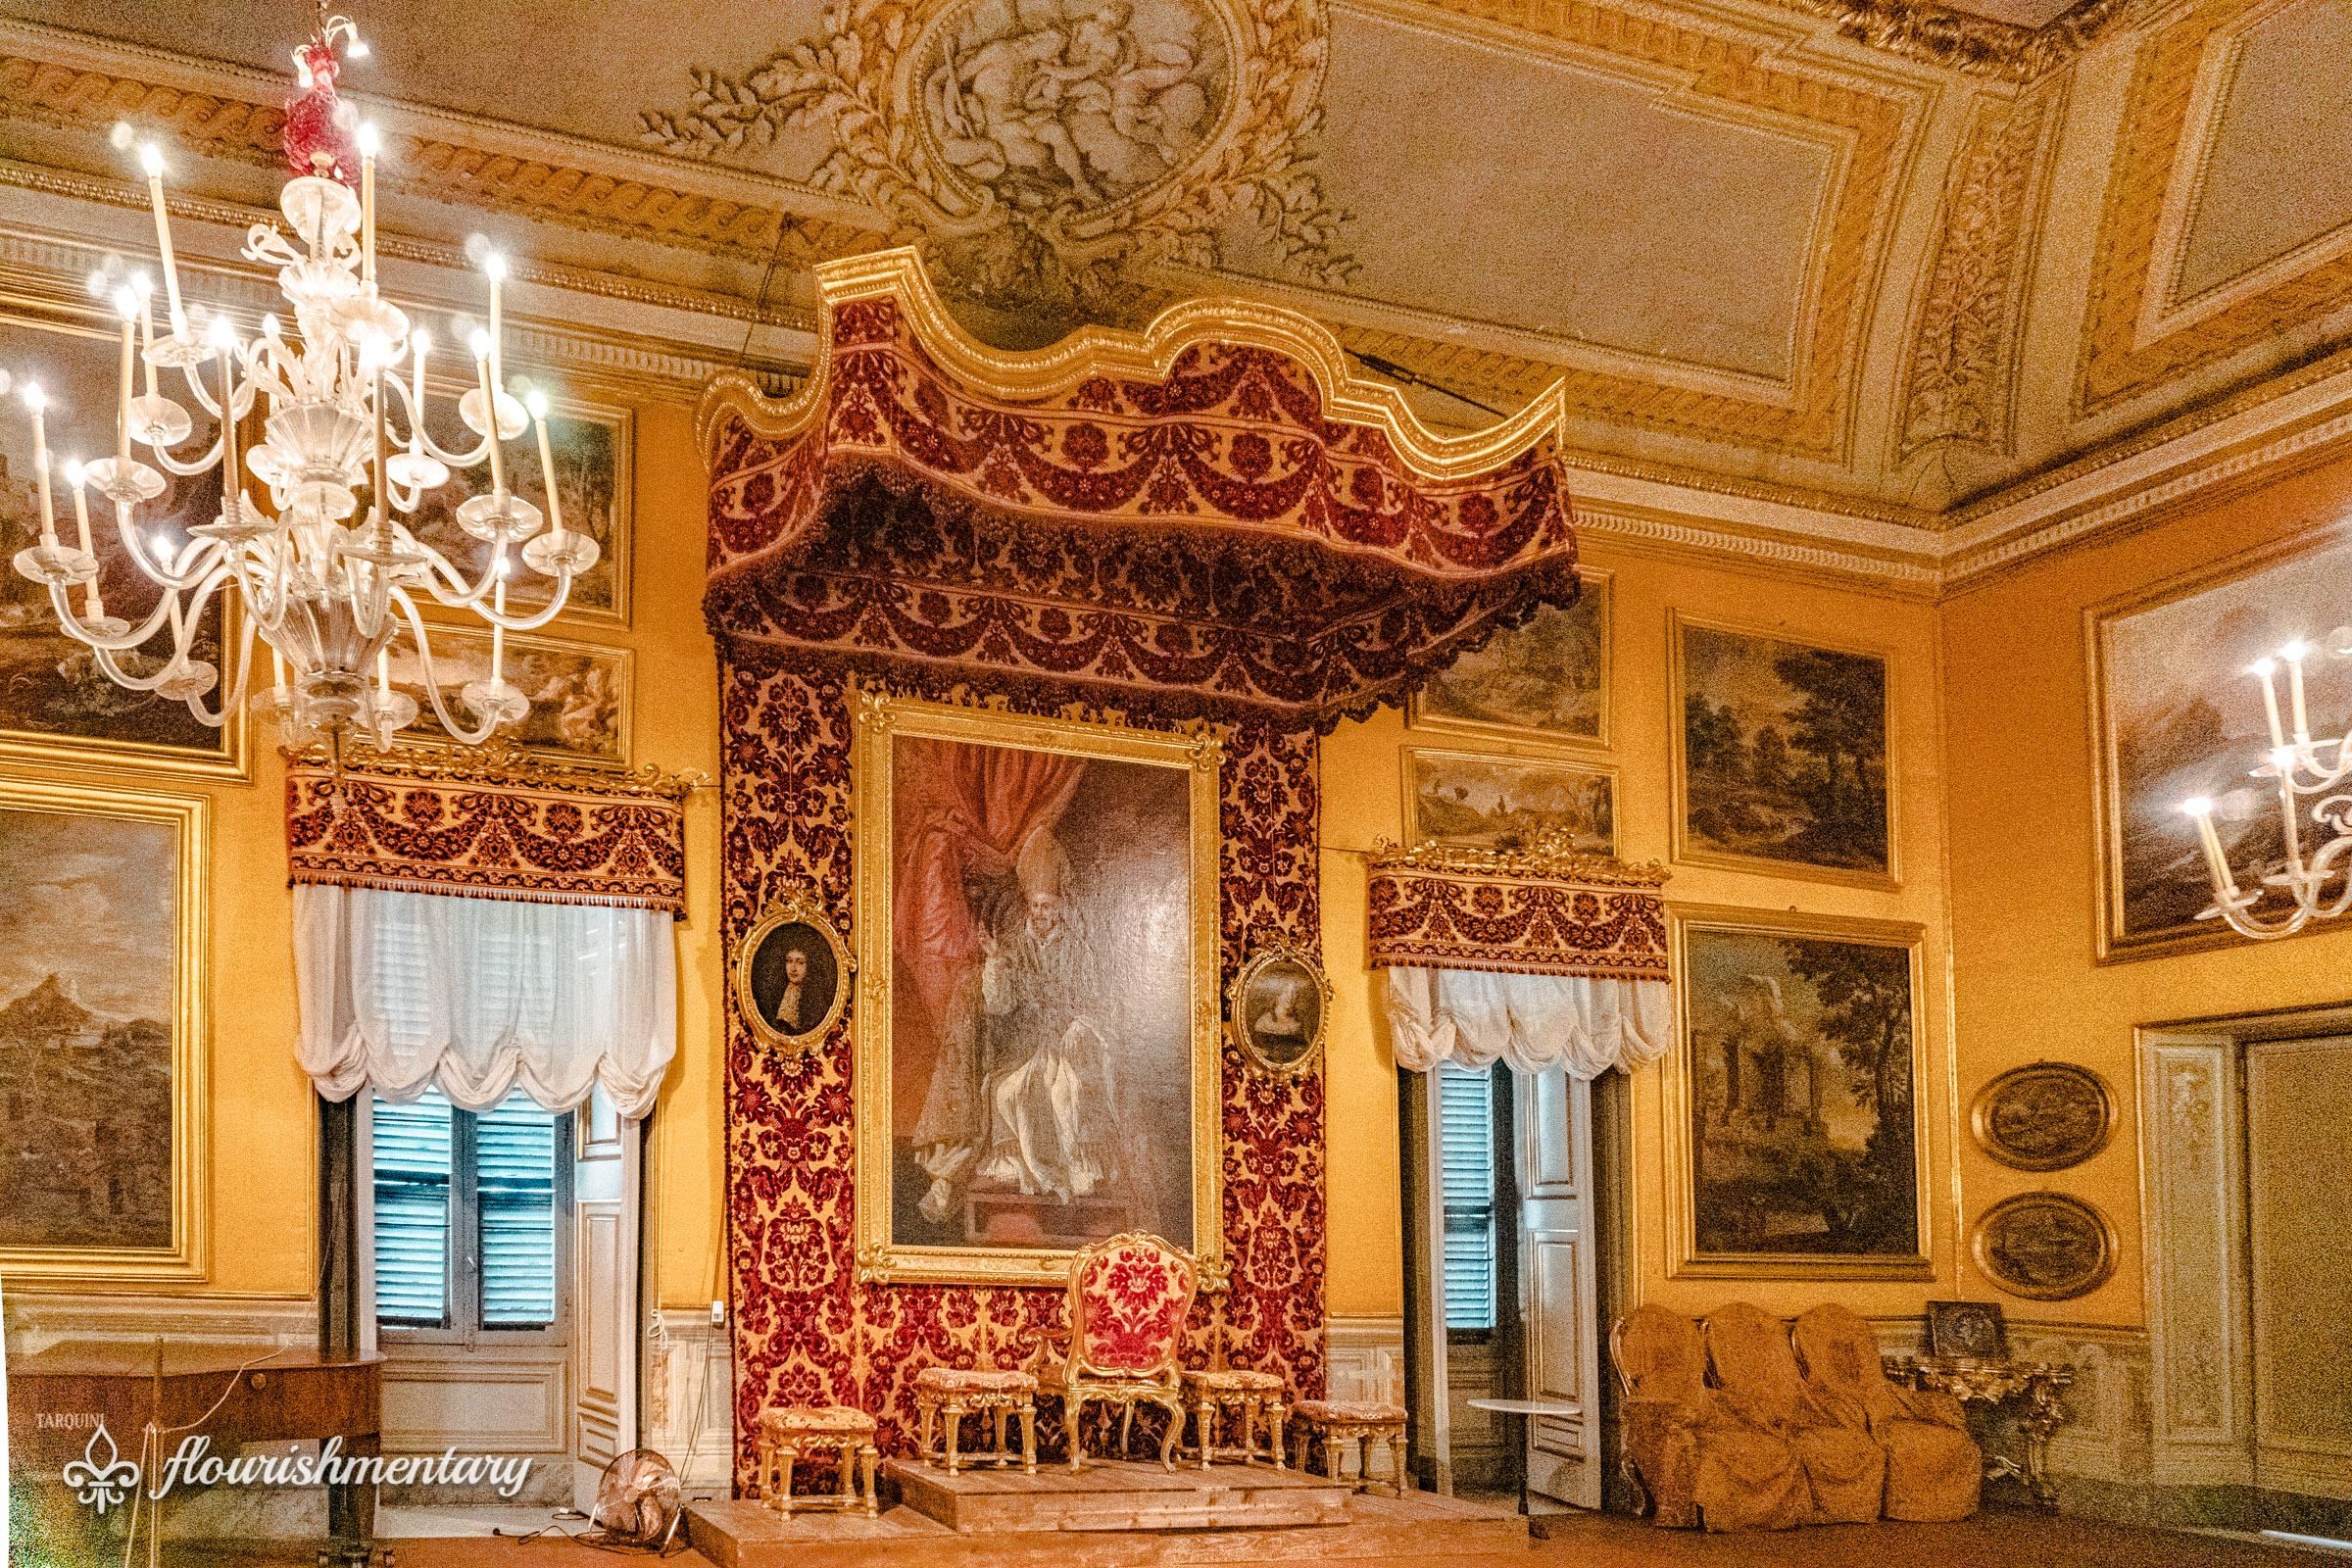 The Throne room Galleria Doria Pamphilj